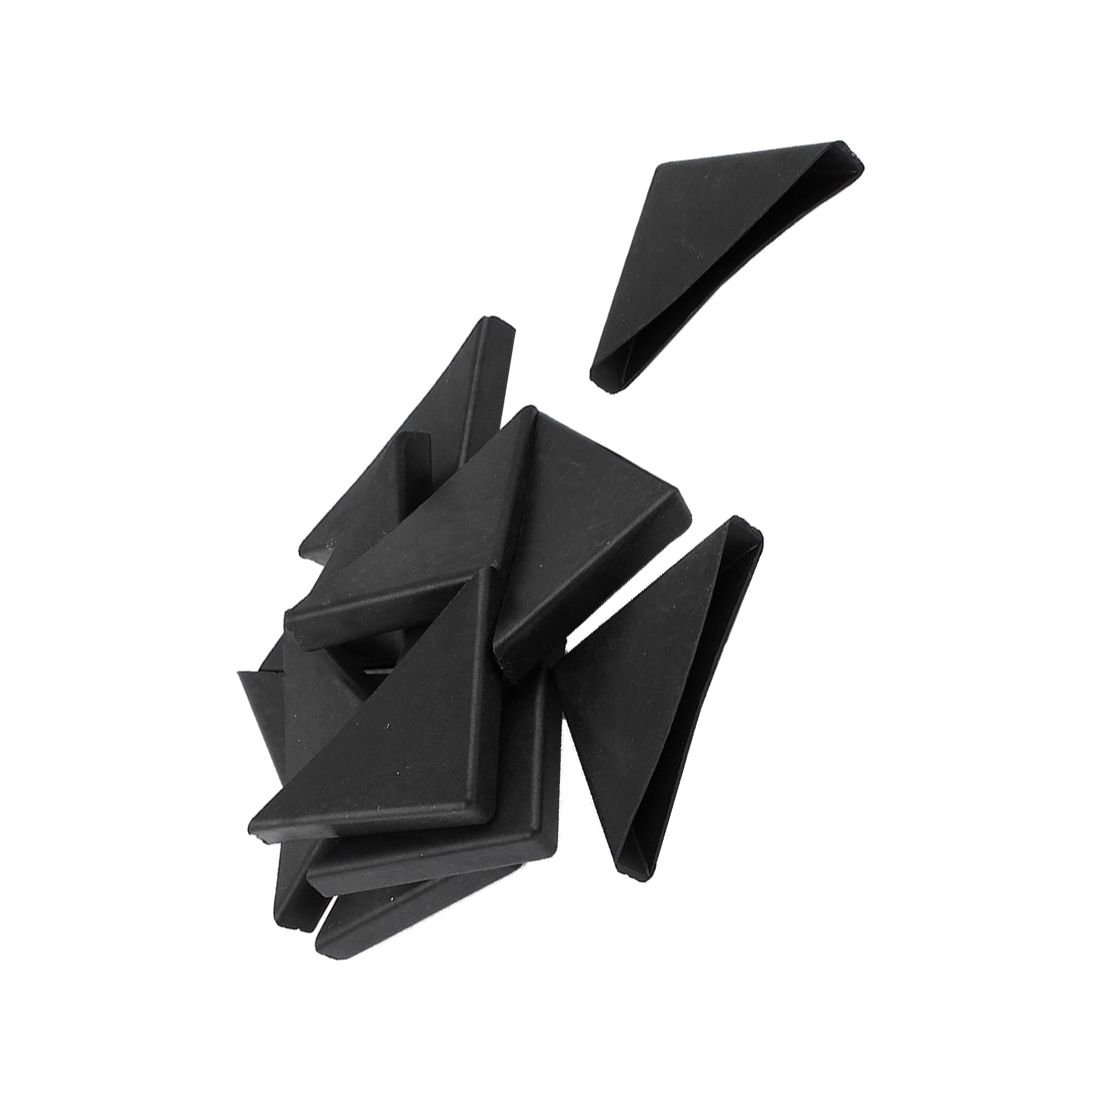 TOOGOO 12 Pc Shape Triple-cornered Glass Table Corner Protector Cushion 10mm x 75mm